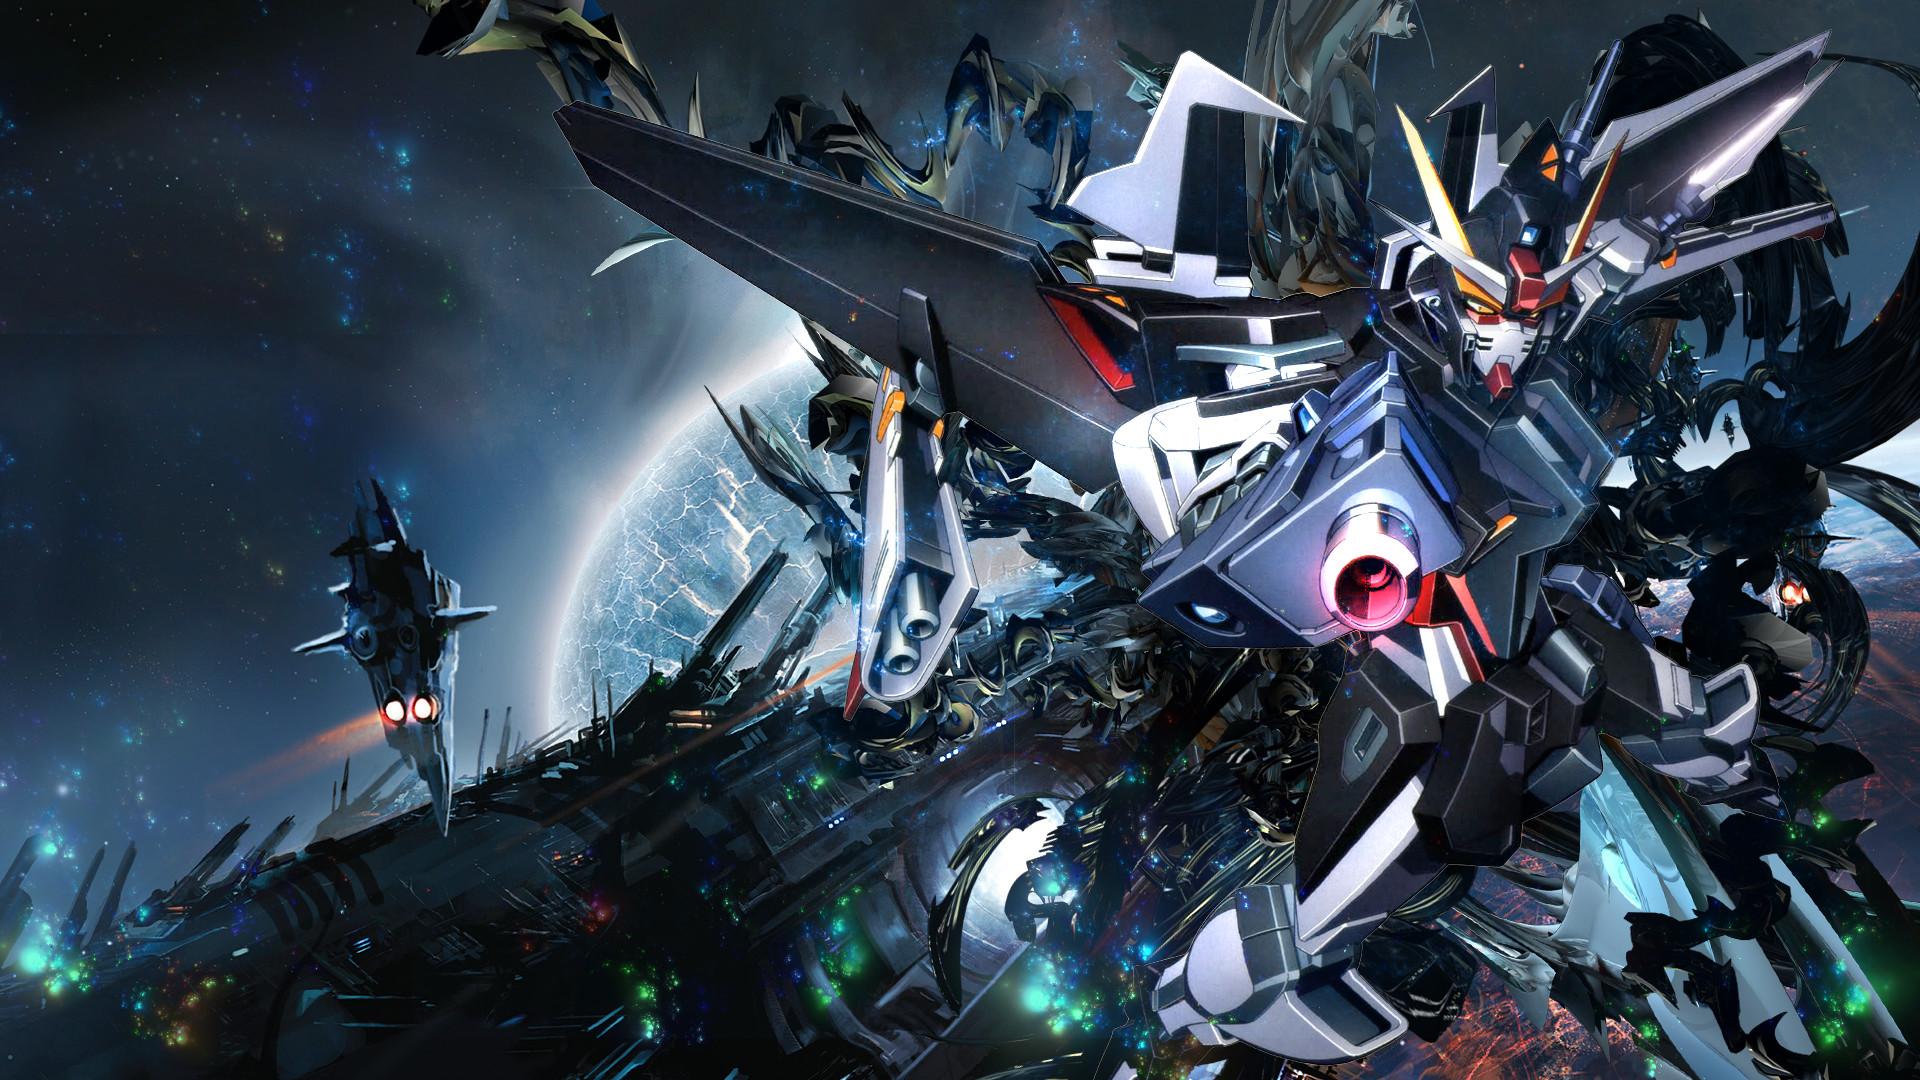 Best Looking Cars Wallpapers Gundam Wing Deathscythe Wallpaper 74 Images